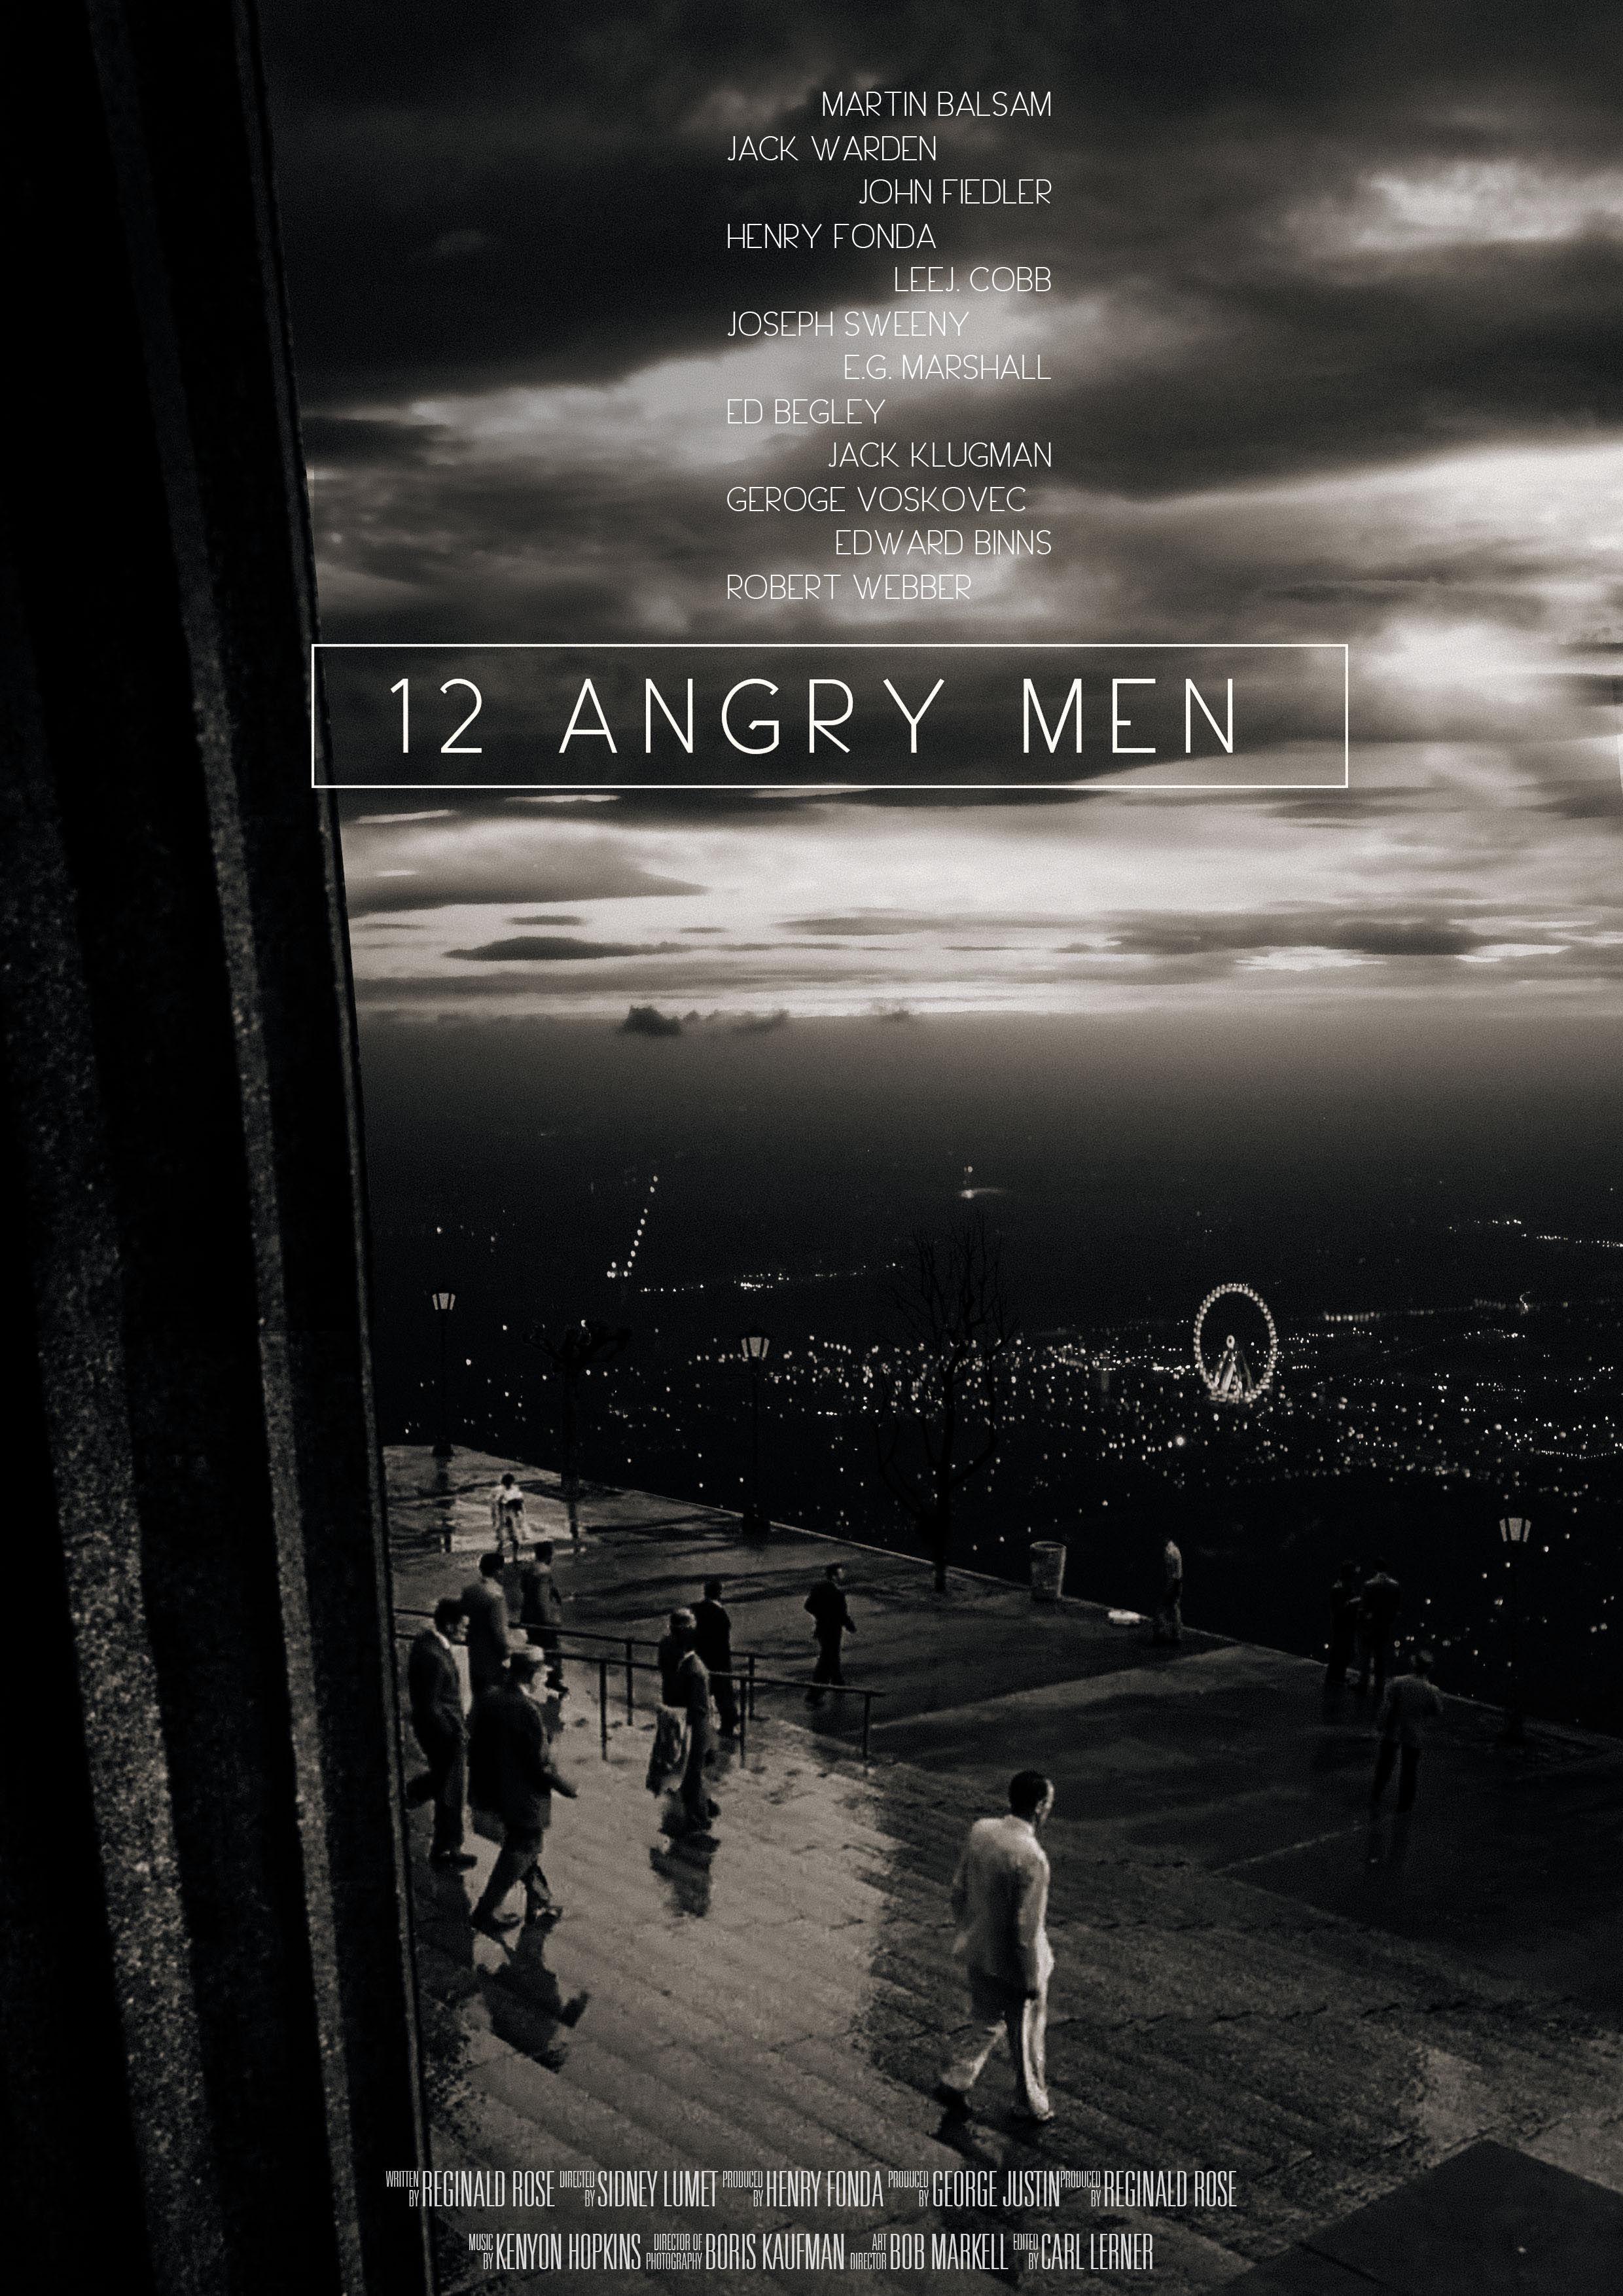 12 Angry Men (1957) Movie Wallpaper #12AngryMen #12AngryMen1957 | 12 ...